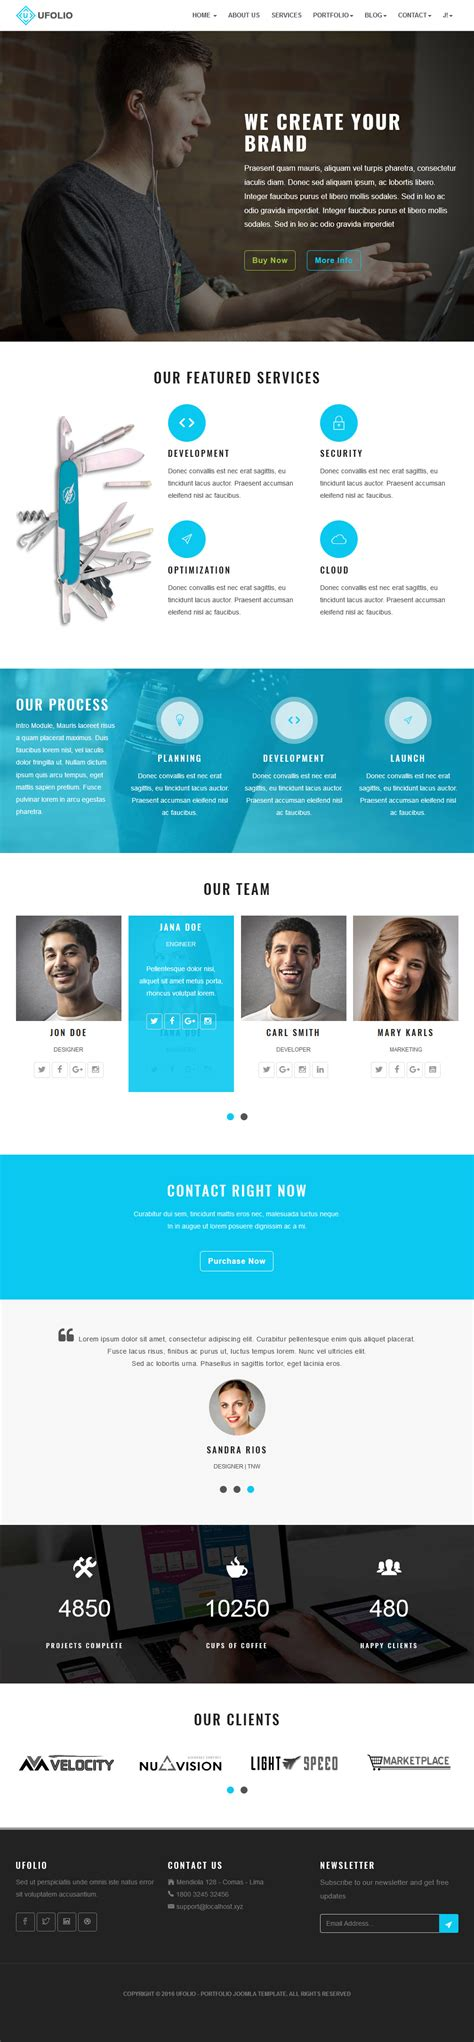 portfolio layout joomla ufolio portfolio joomla template themes templates